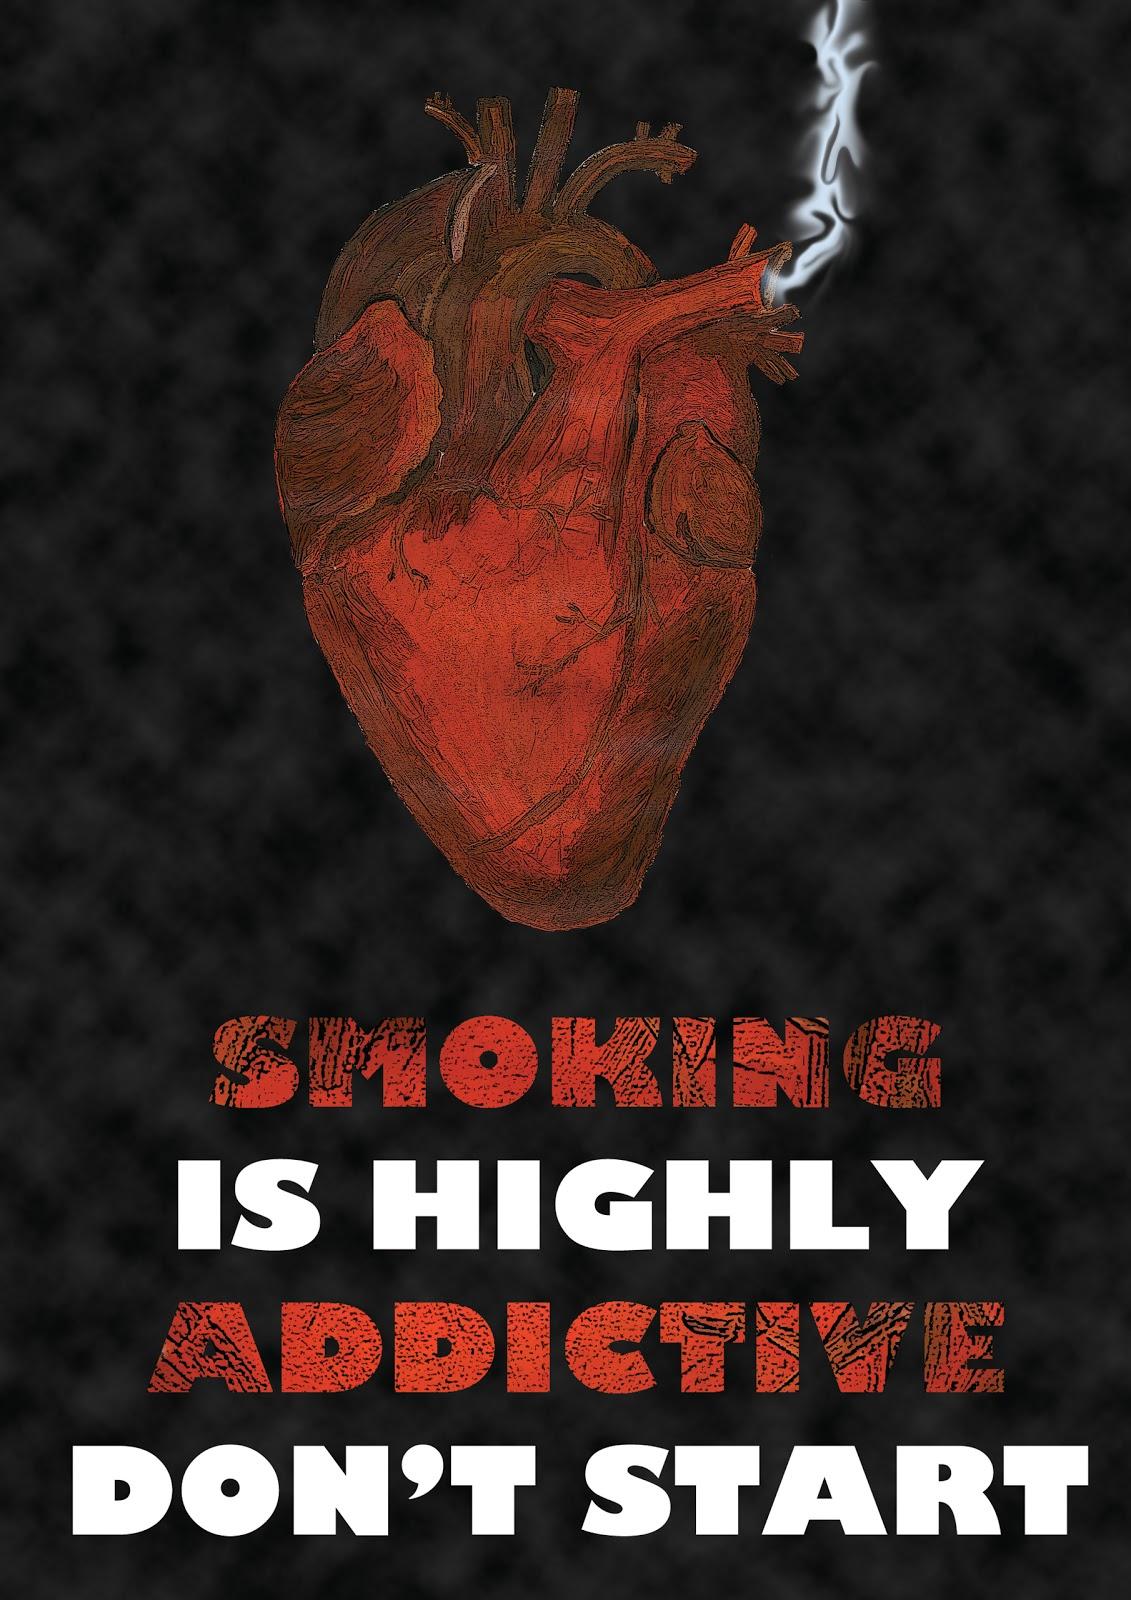 smoking campaign essay